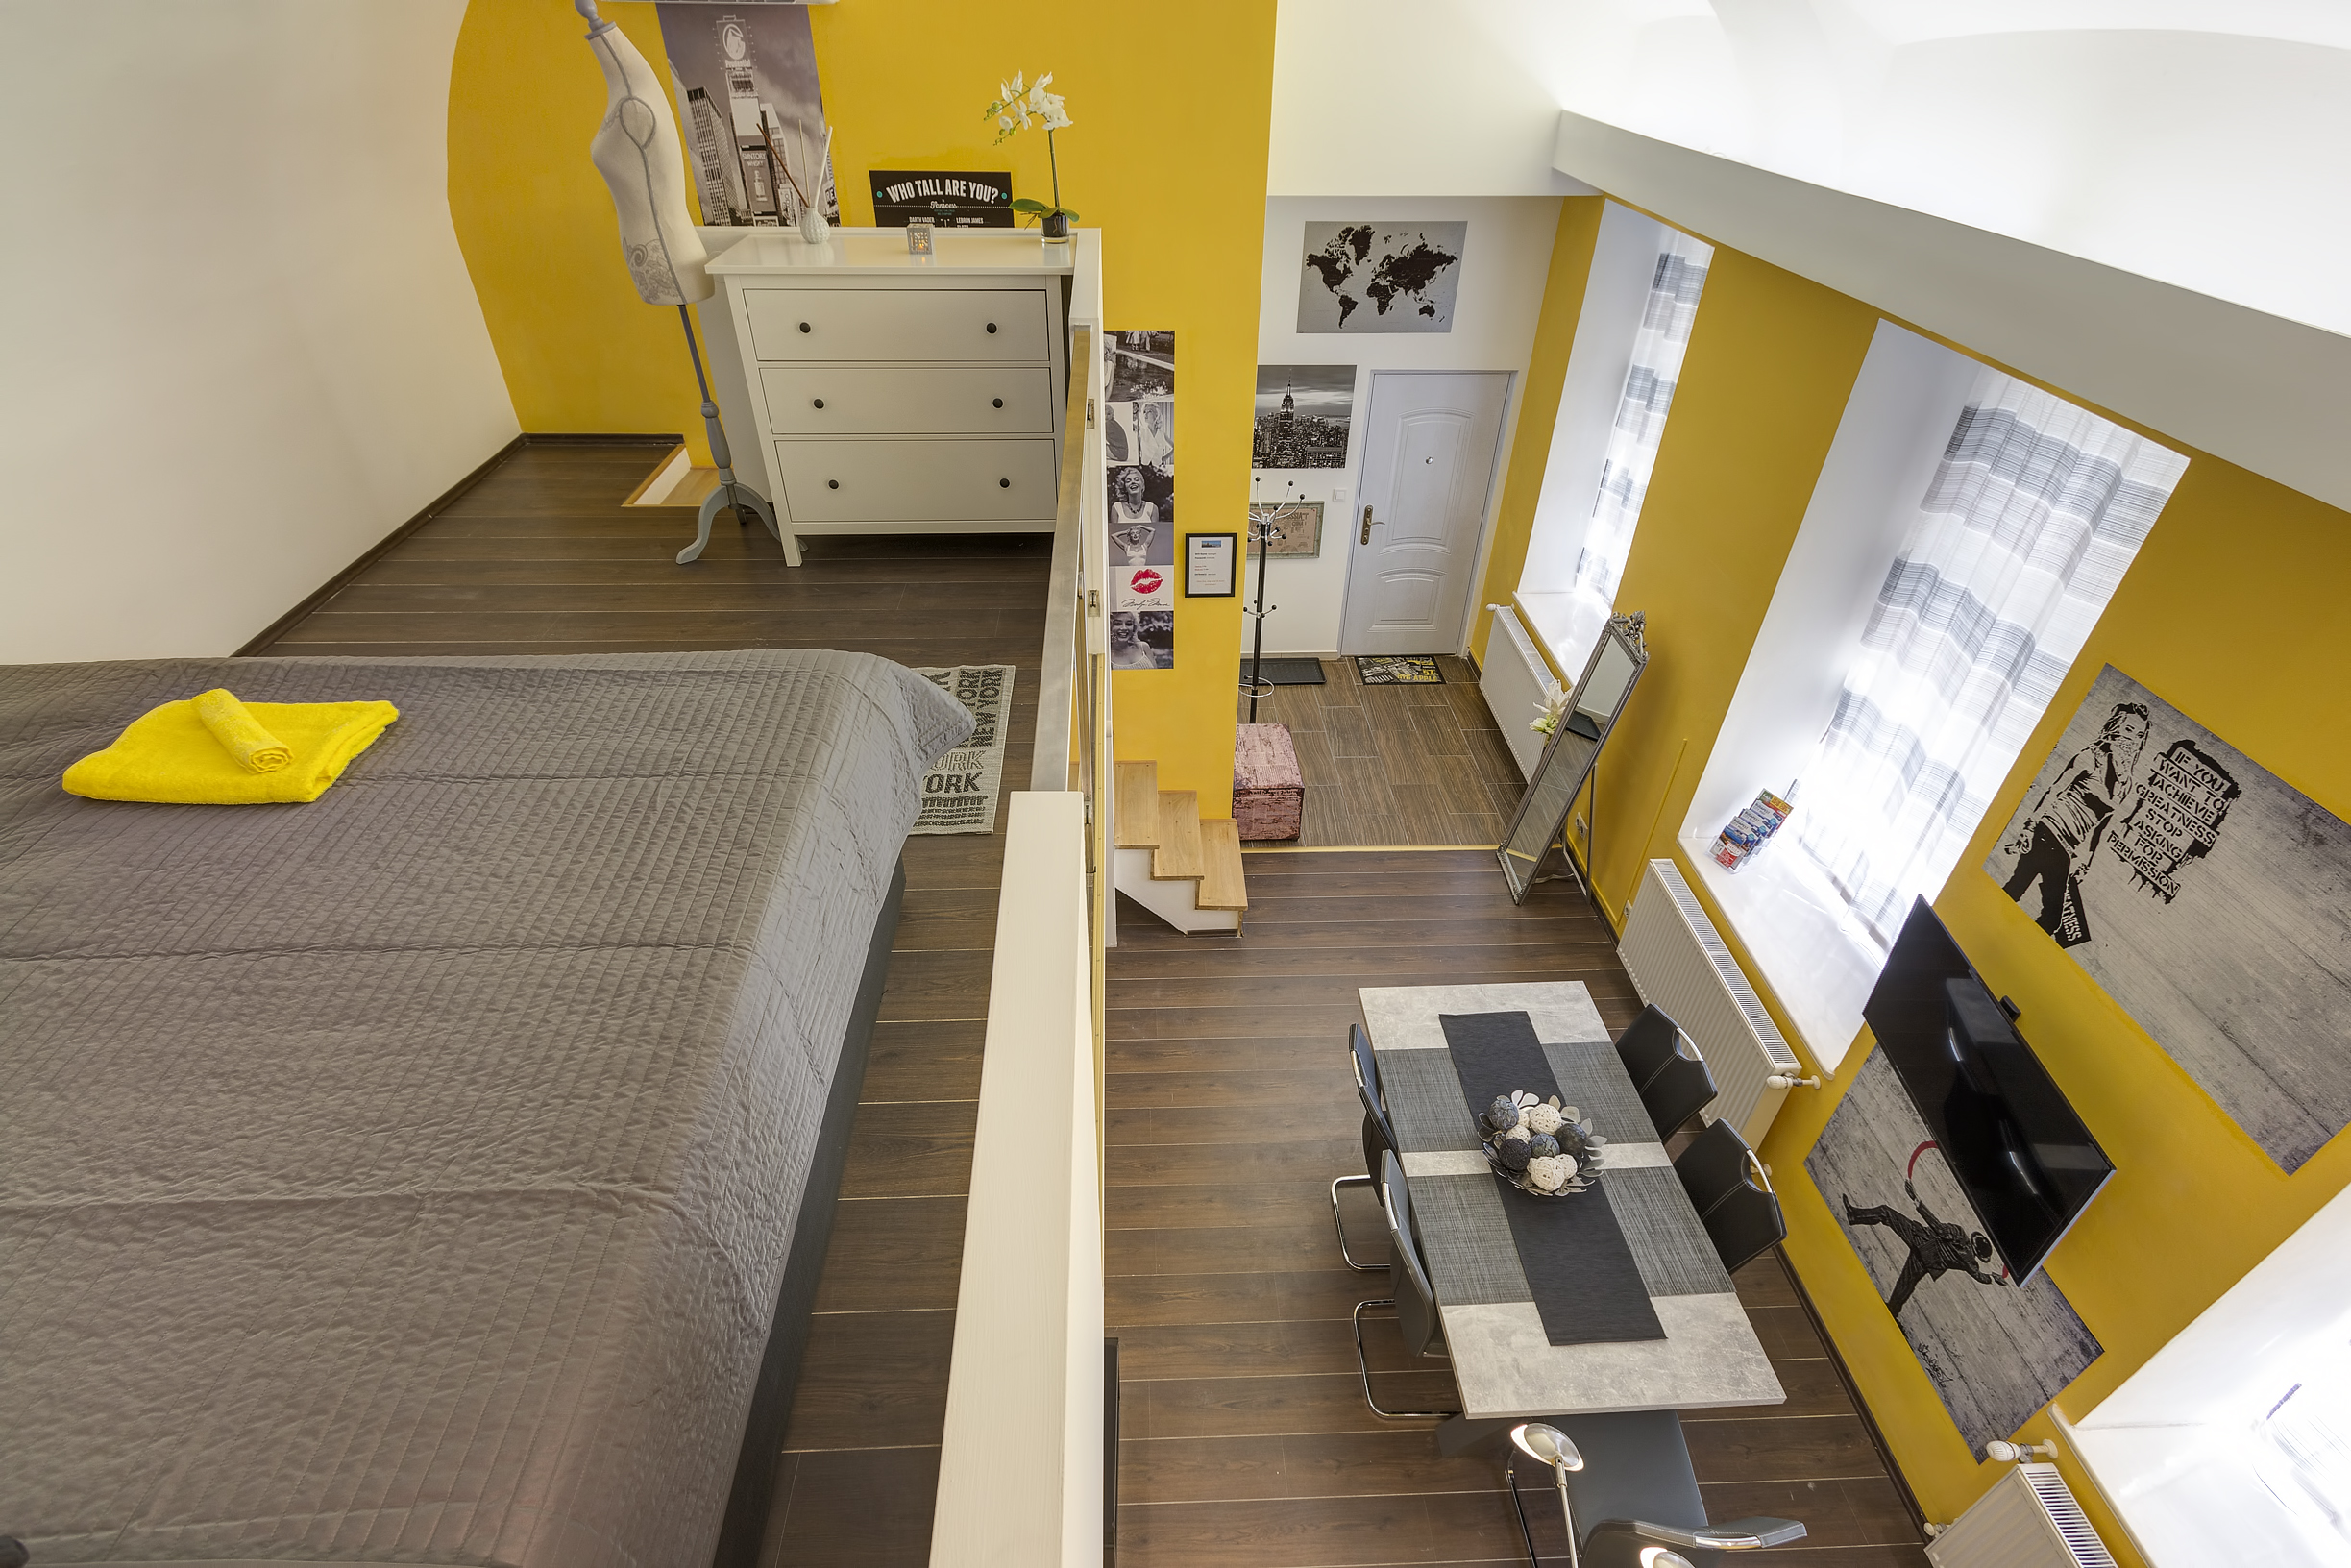 The large loft room